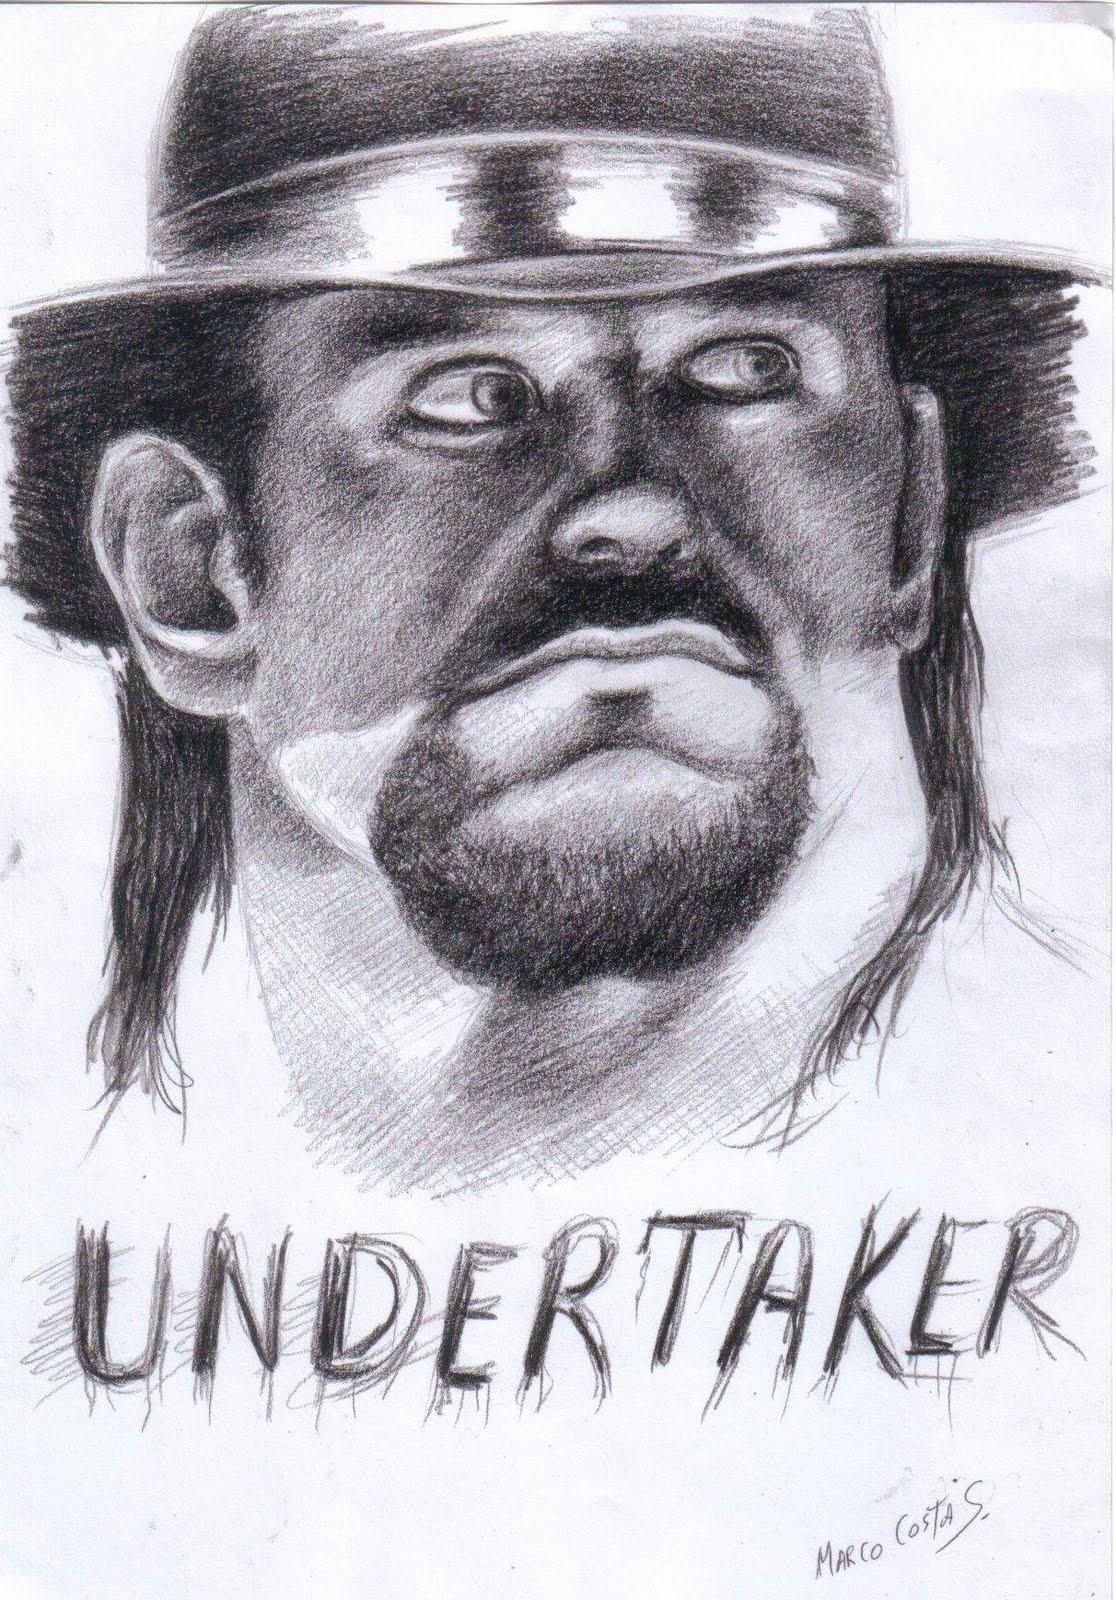 http://3.bp.blogspot.com/_dvkQiAkihhs/S8tr1rsrlFI/AAAAAAAAAVo/Wypv4xqoh4o/s1600/undertaker.jpg